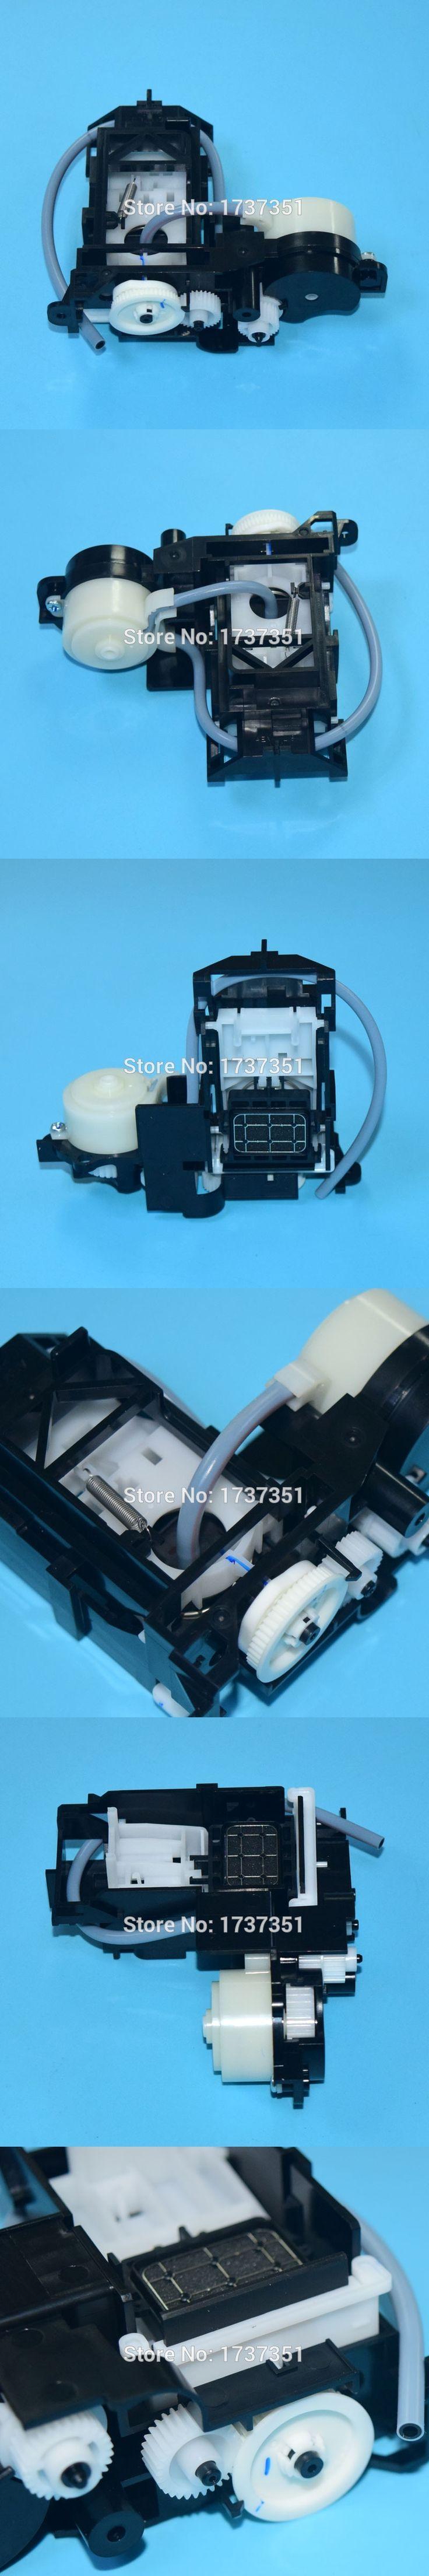 Ink Pump for Epson L800 printer